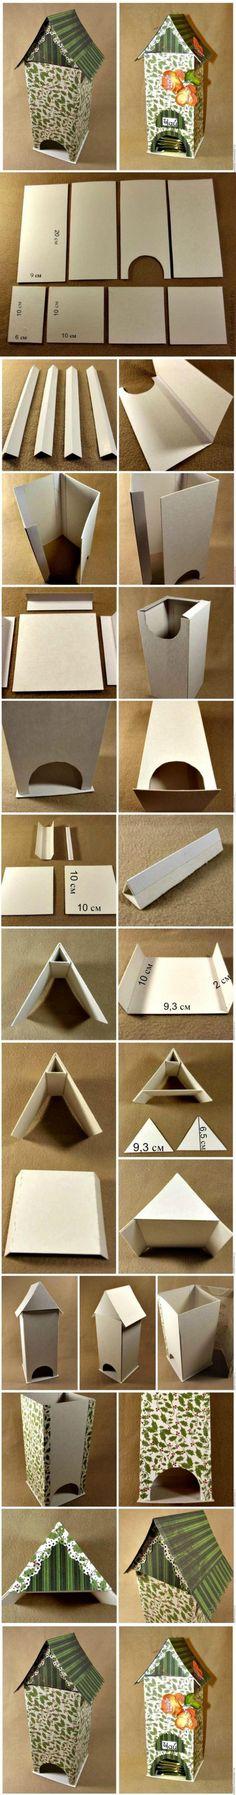 DIY Cardboard Tea Bag Dispenser DIY Projects